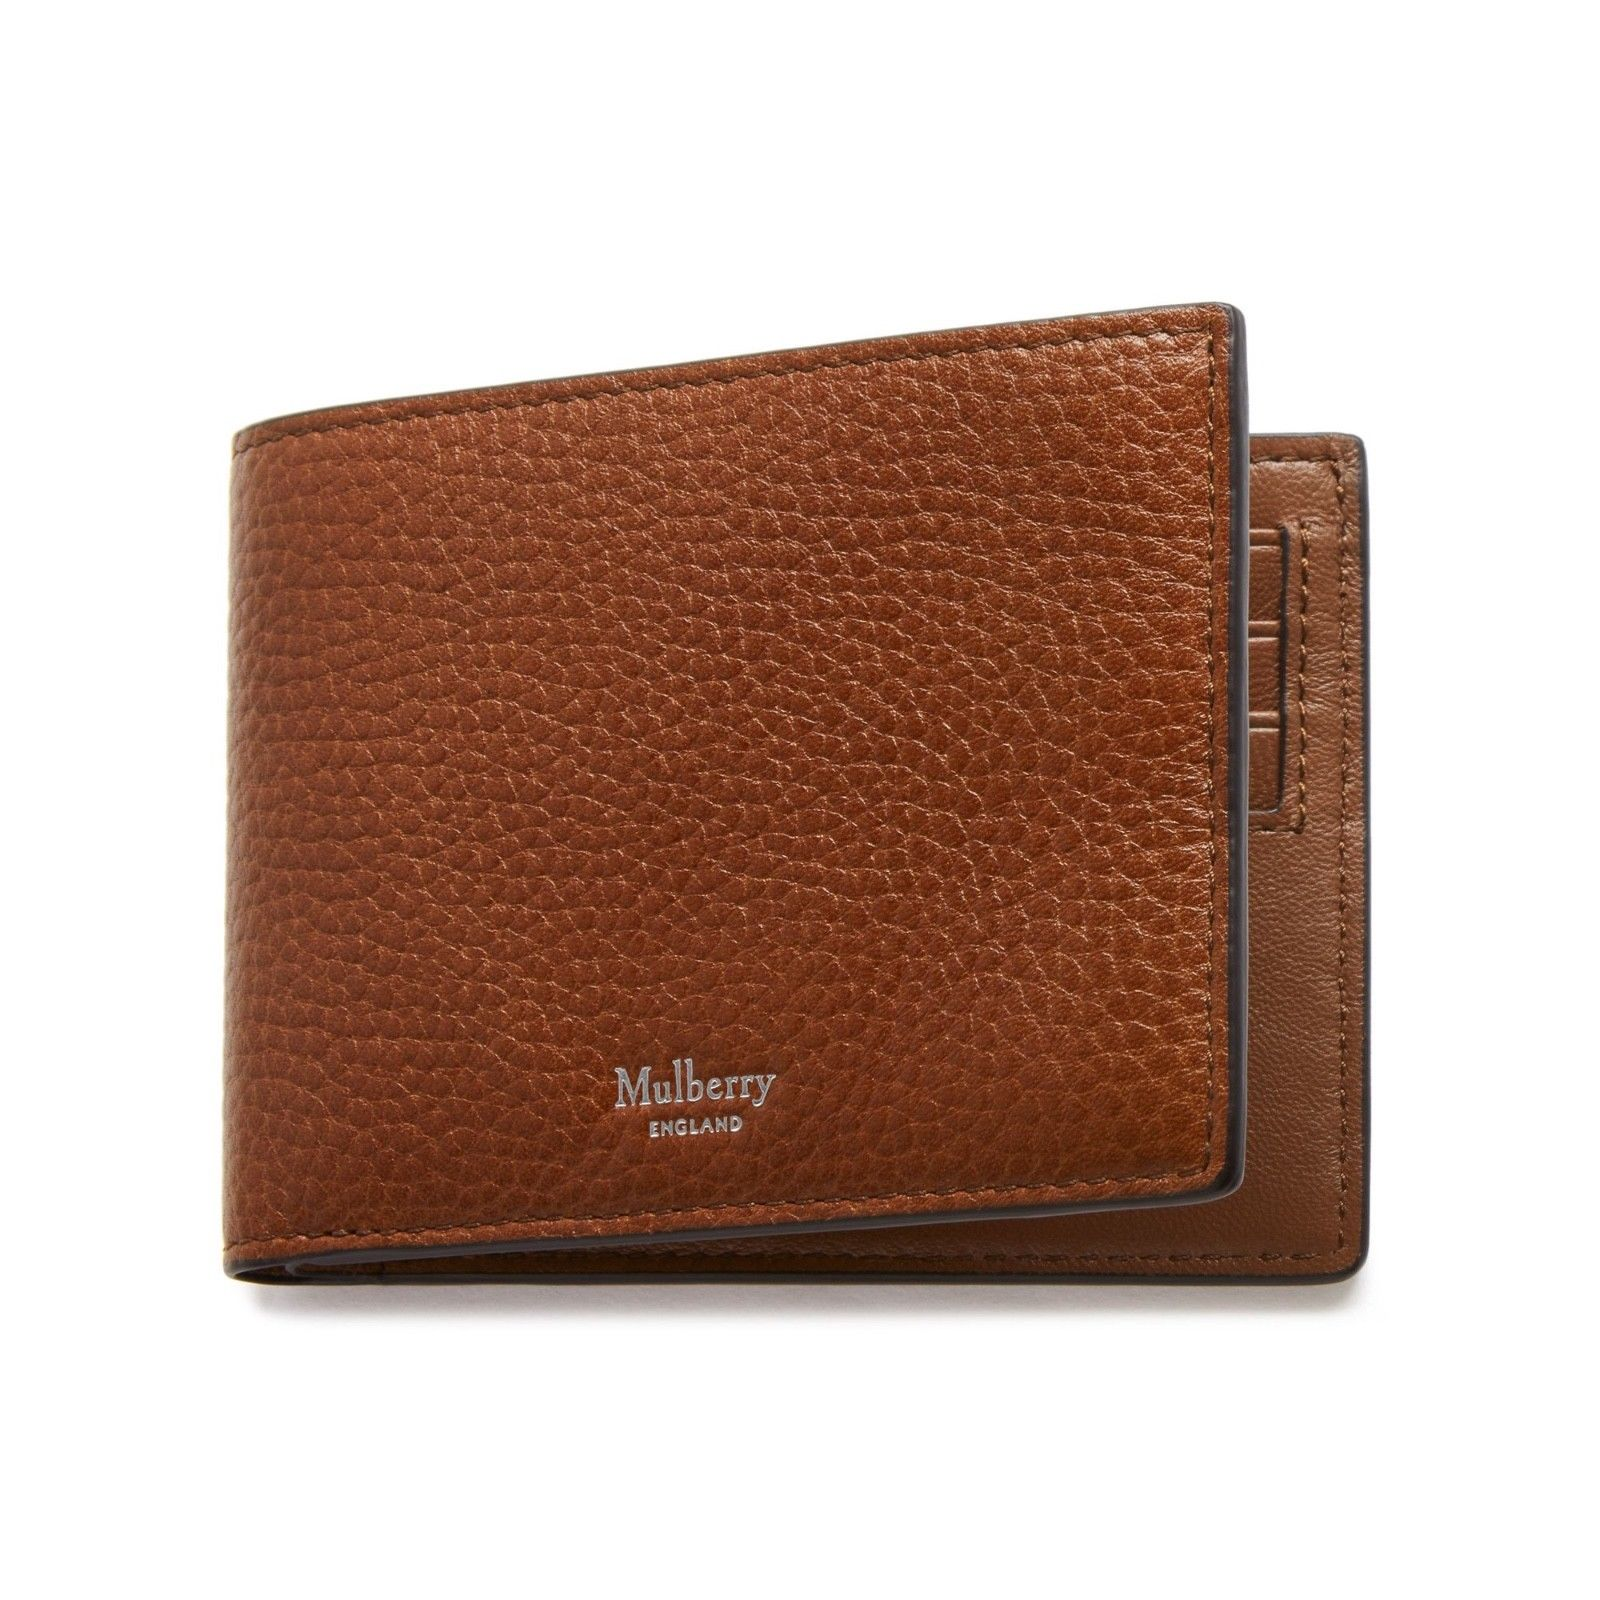 918f099b91f4 Mulberry Mulberry Men s 8 Card CC Natural Grain Leather Wallet Oak ...